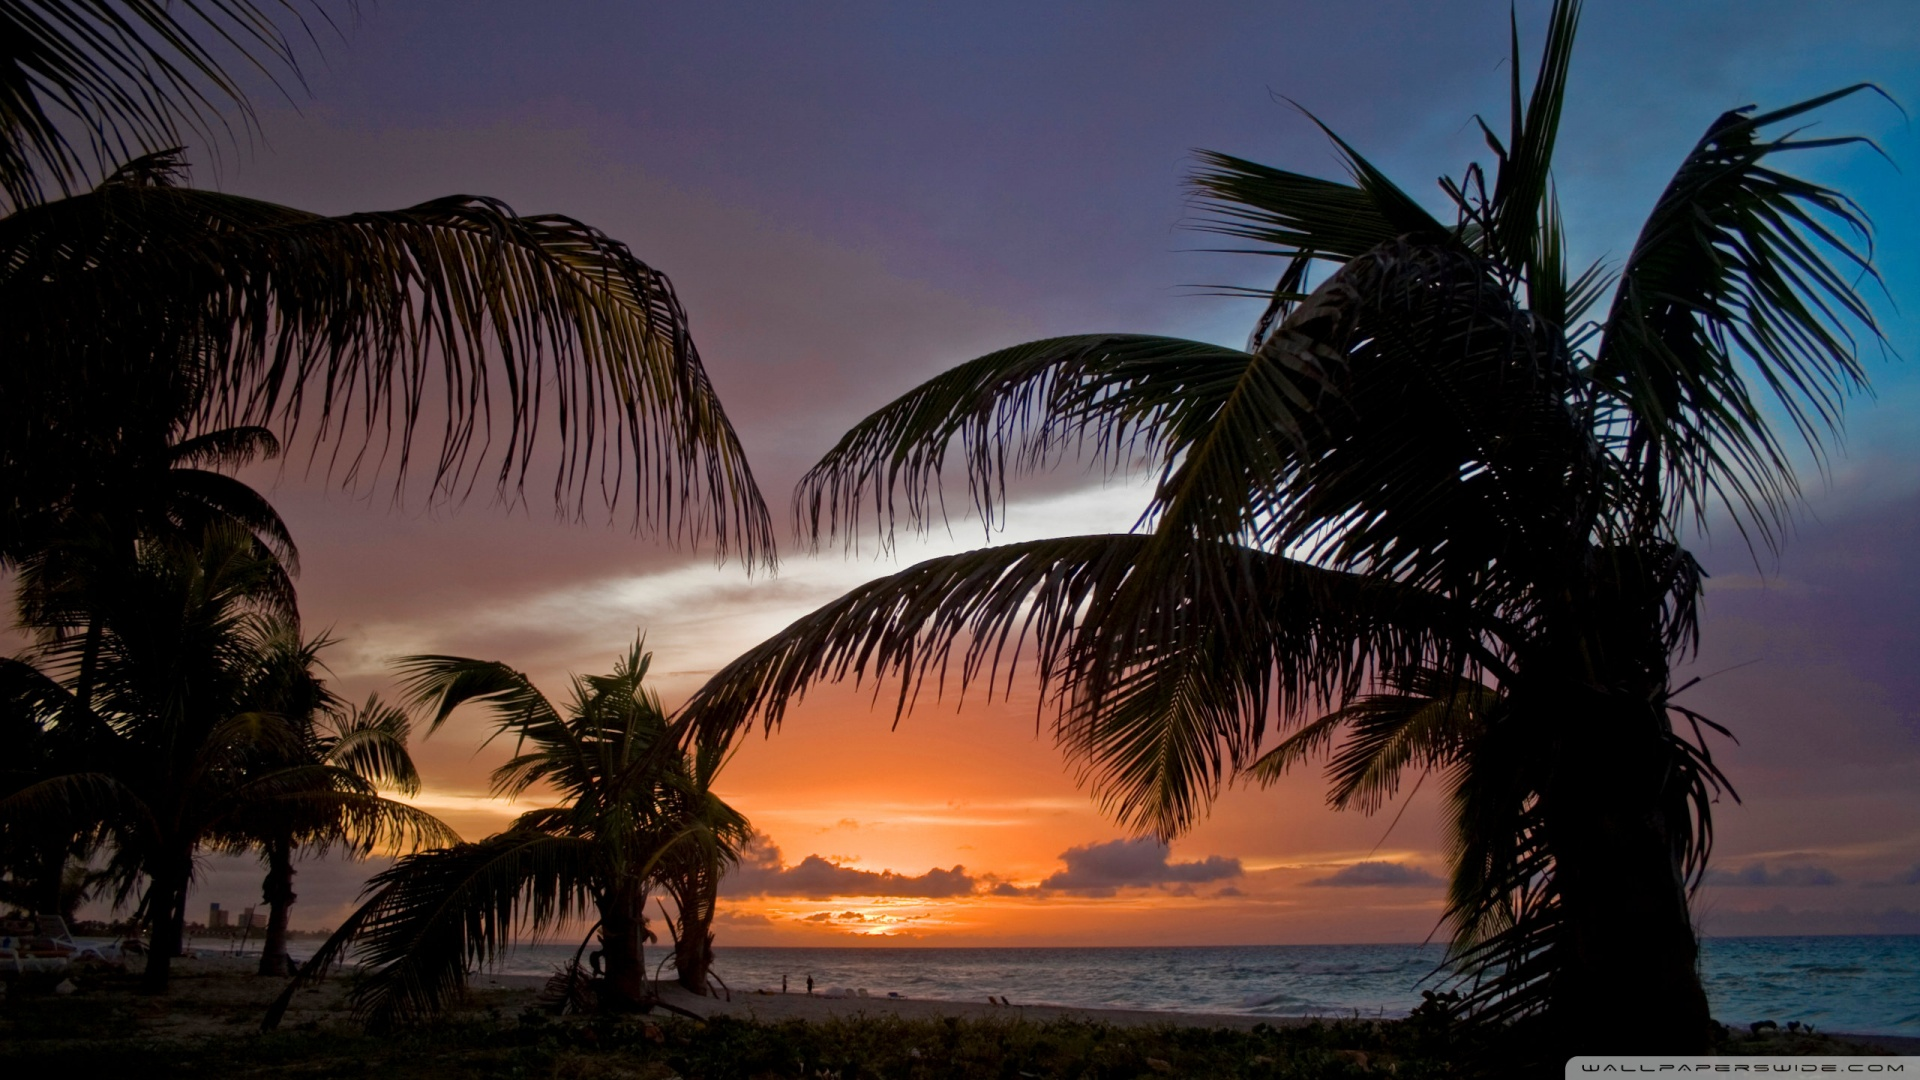 Sunset Palm Trees Wallpaper Wallpapersafari